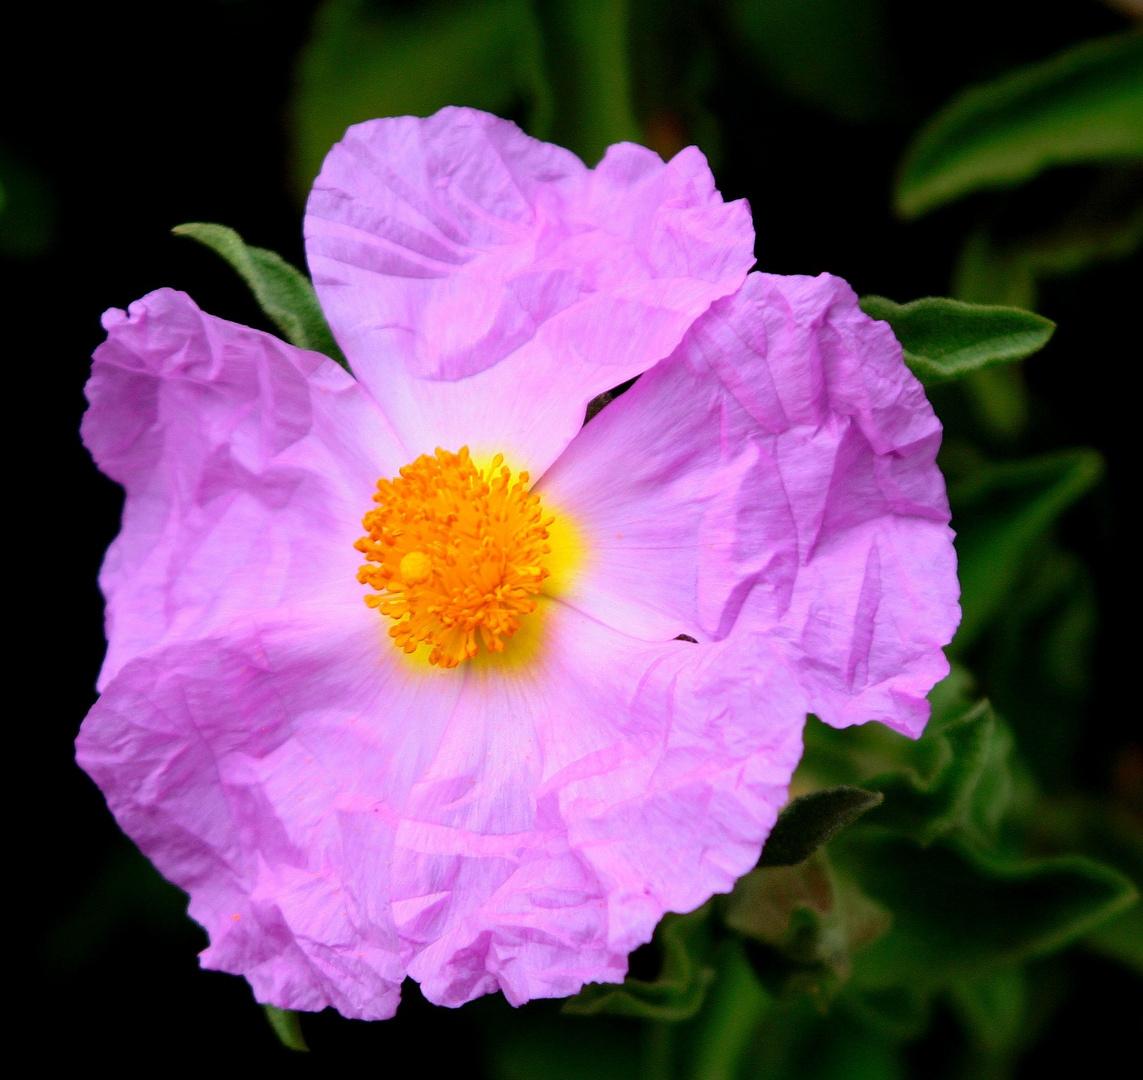 la fleurette de chiffon